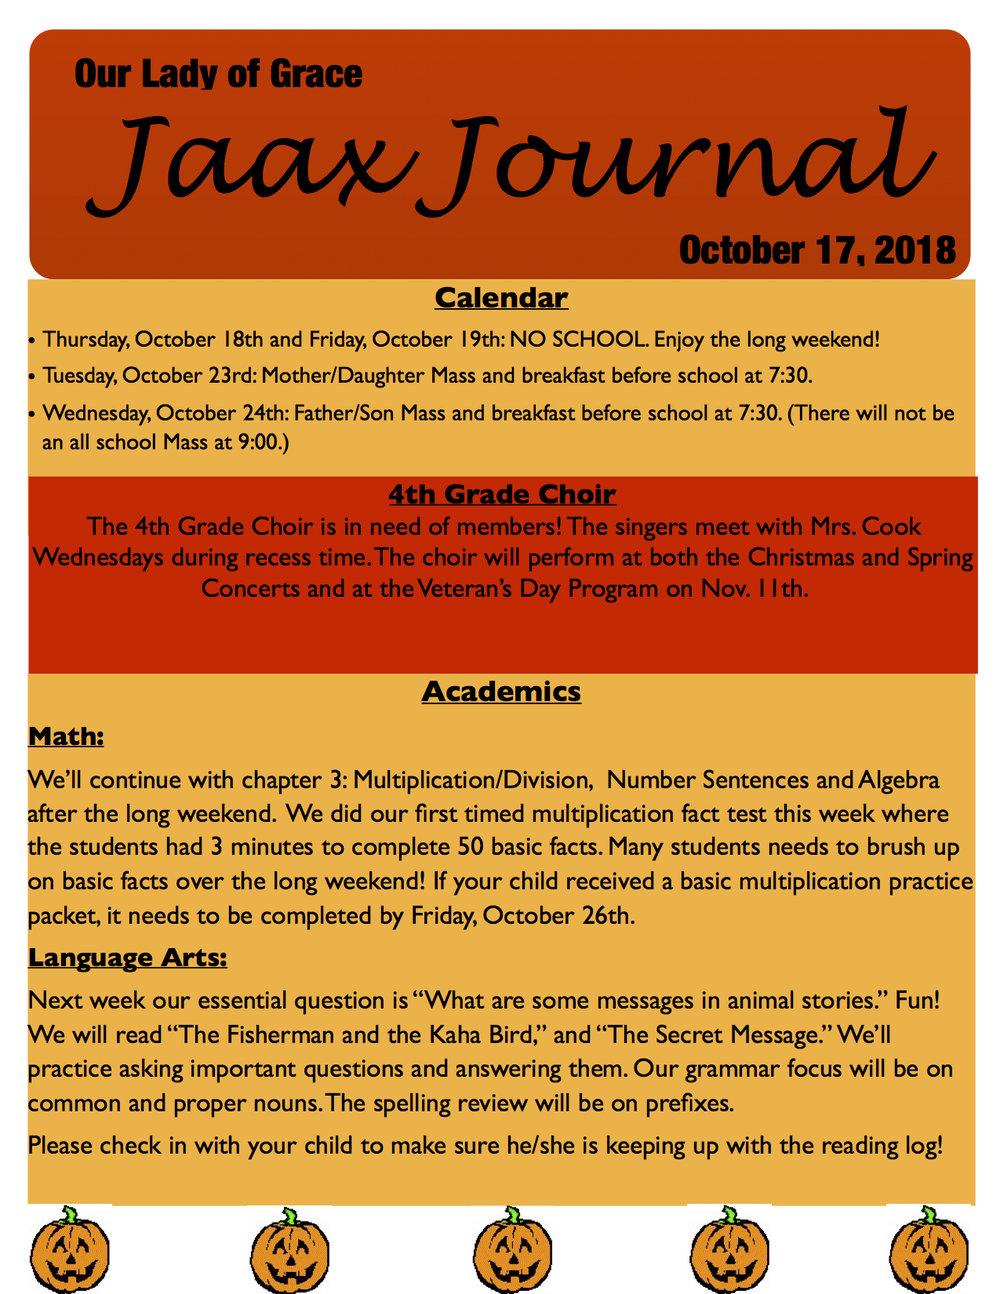 JaaxJournal10-17-18.jpg